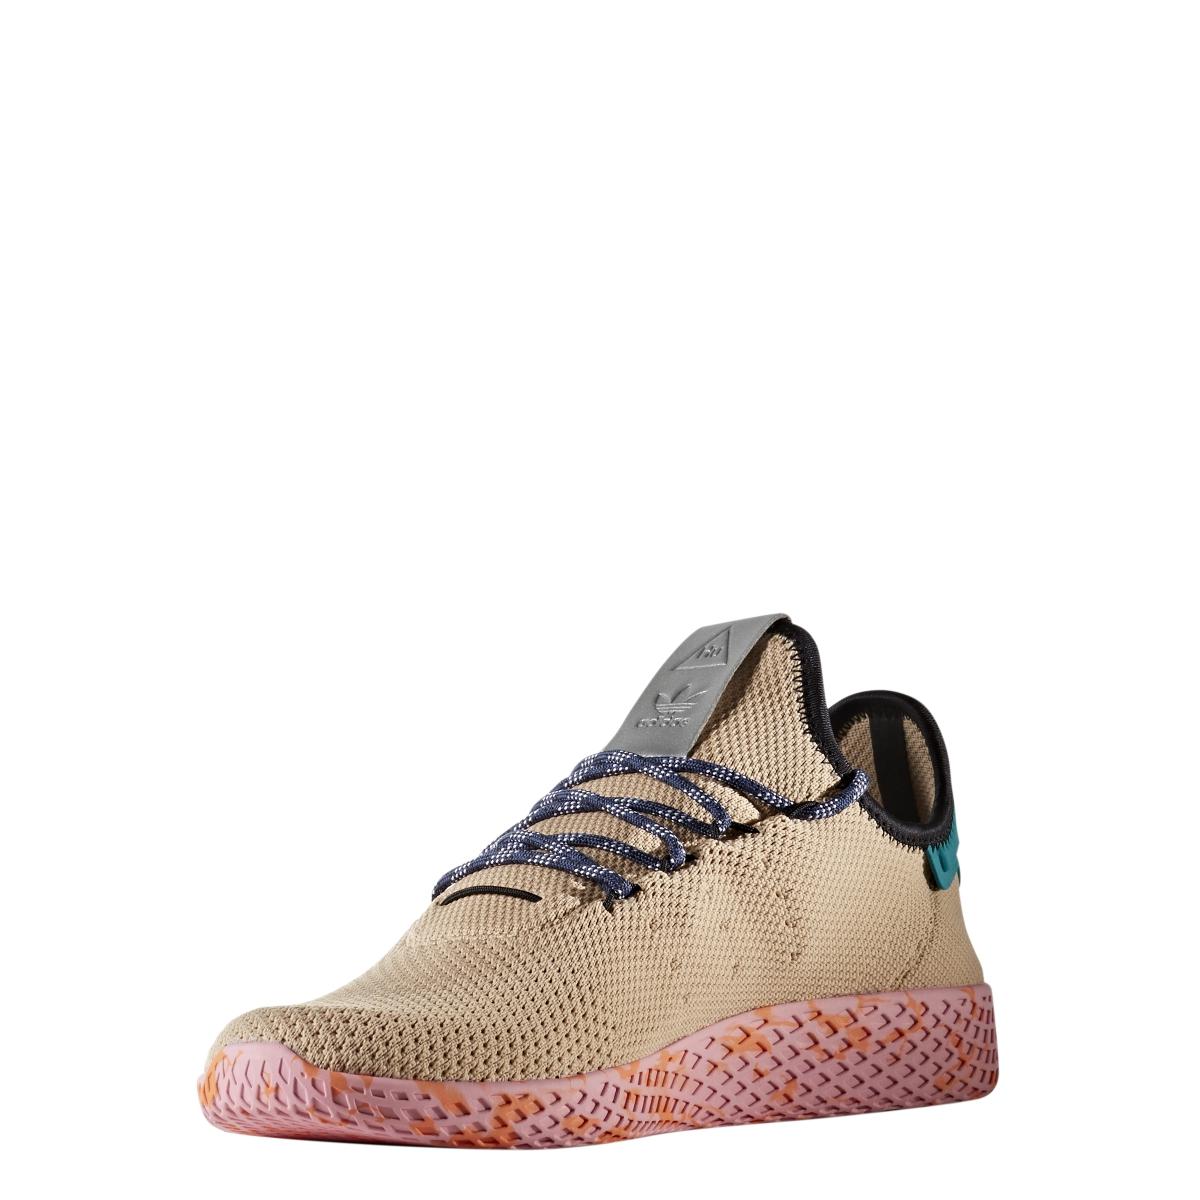 3ab9f93a544bd Adidas X Pharrell Williams Tennis Hu in Tan Teal Pink Marble. BY2672.jpg